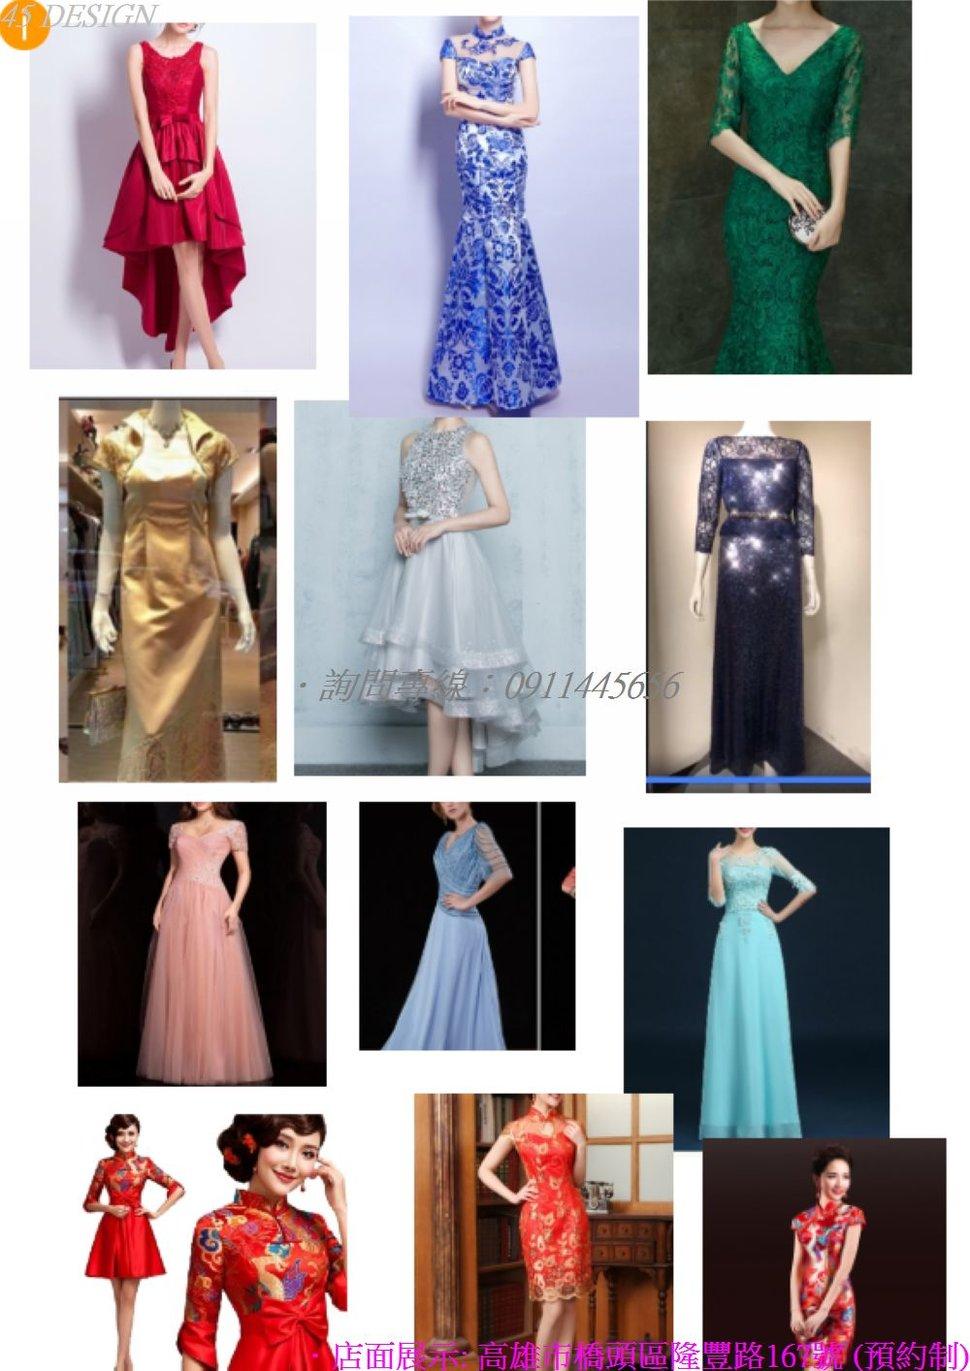 msl19081557AAC0C9ABCF4E92818B5EBE28B213B1 - 全台最便宜-45DESIGN四五婚紗禮服《結婚吧》